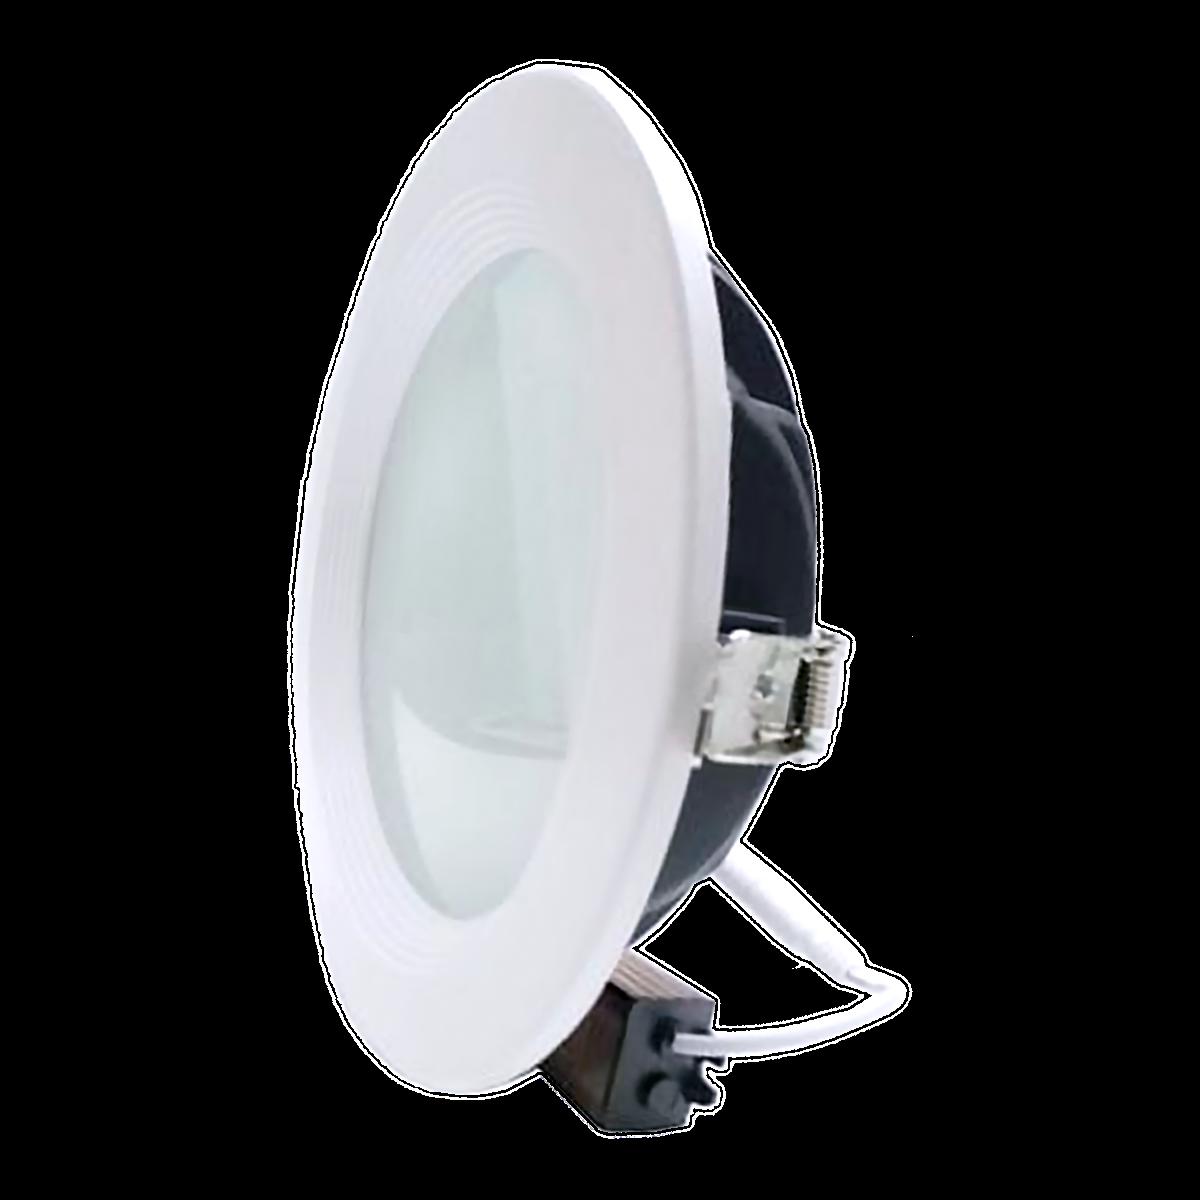 Silamp LED Downlight White Opal